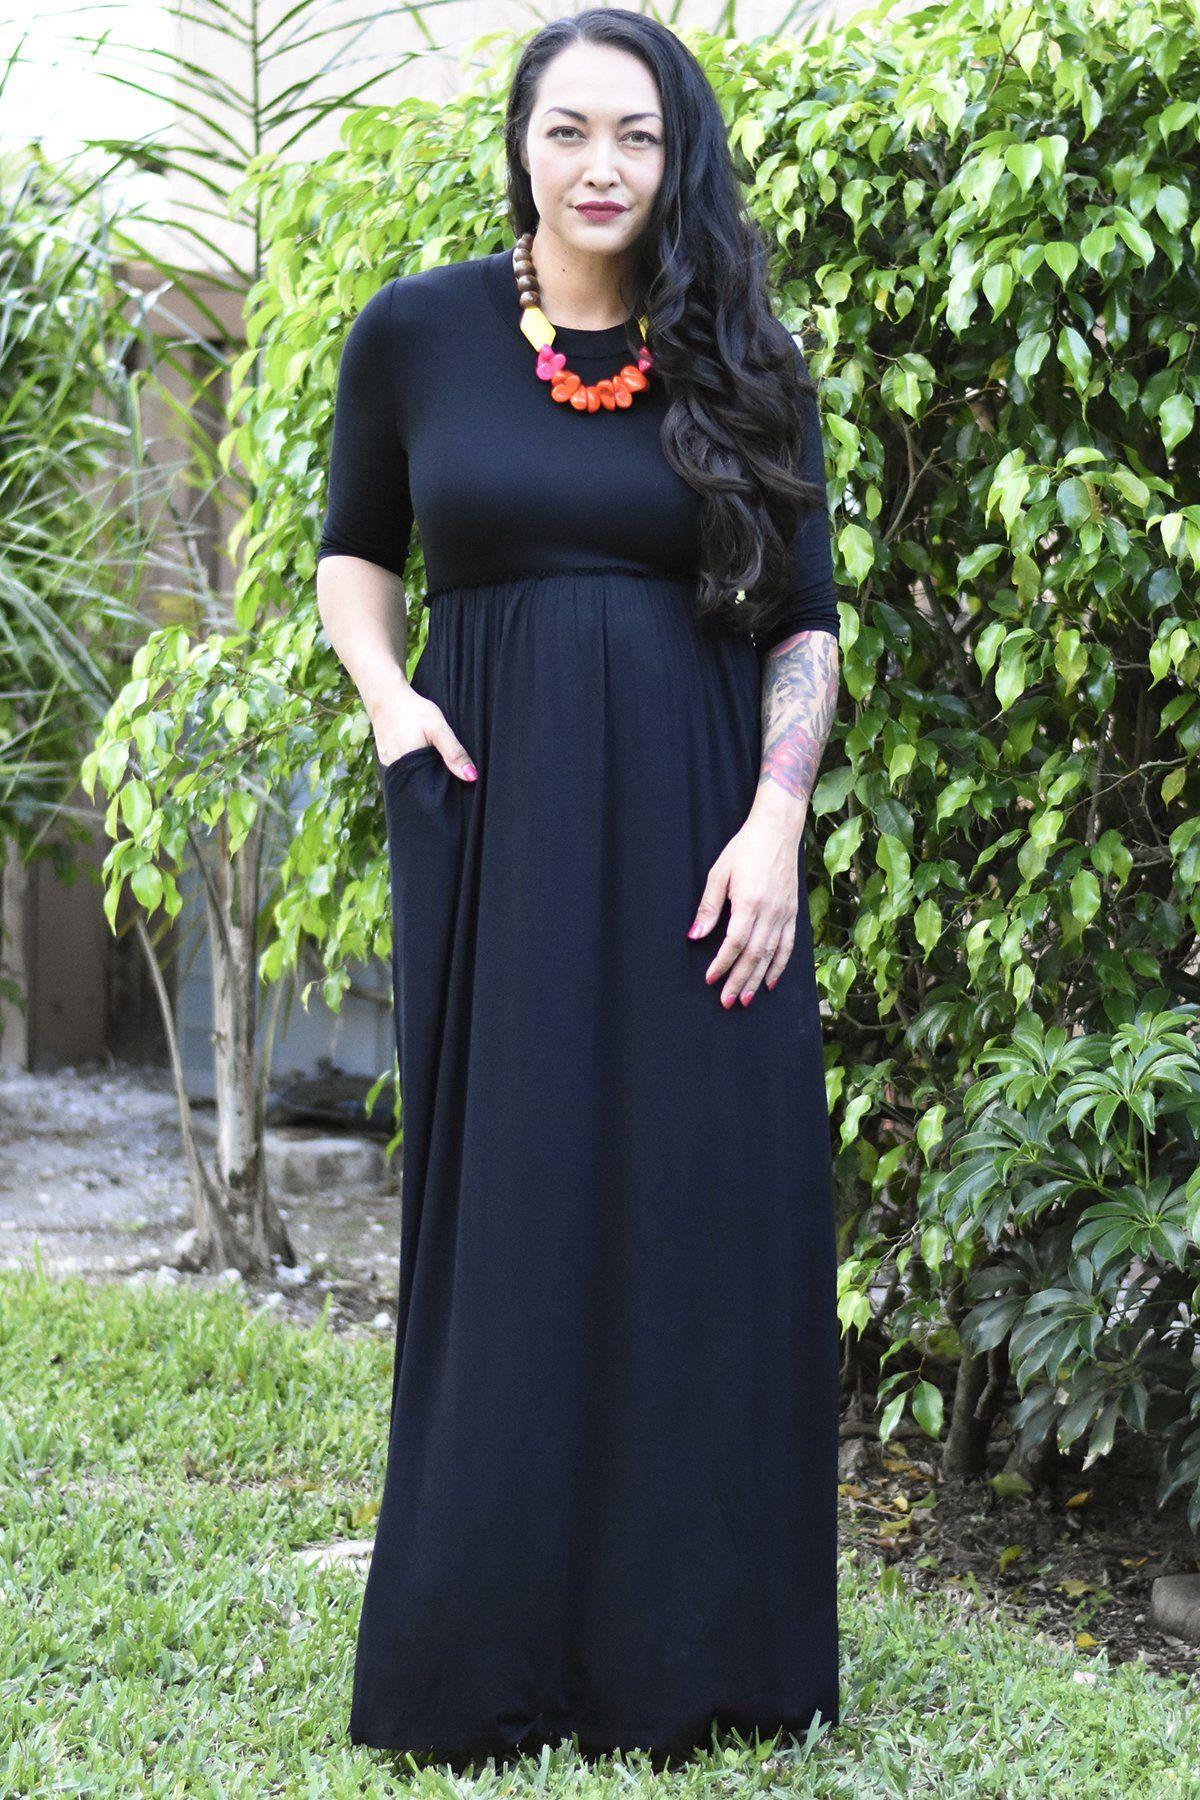 eaa98d9a53 Our Black Maxi Dress has 3 4 sleeve with a cute raw-edged empire